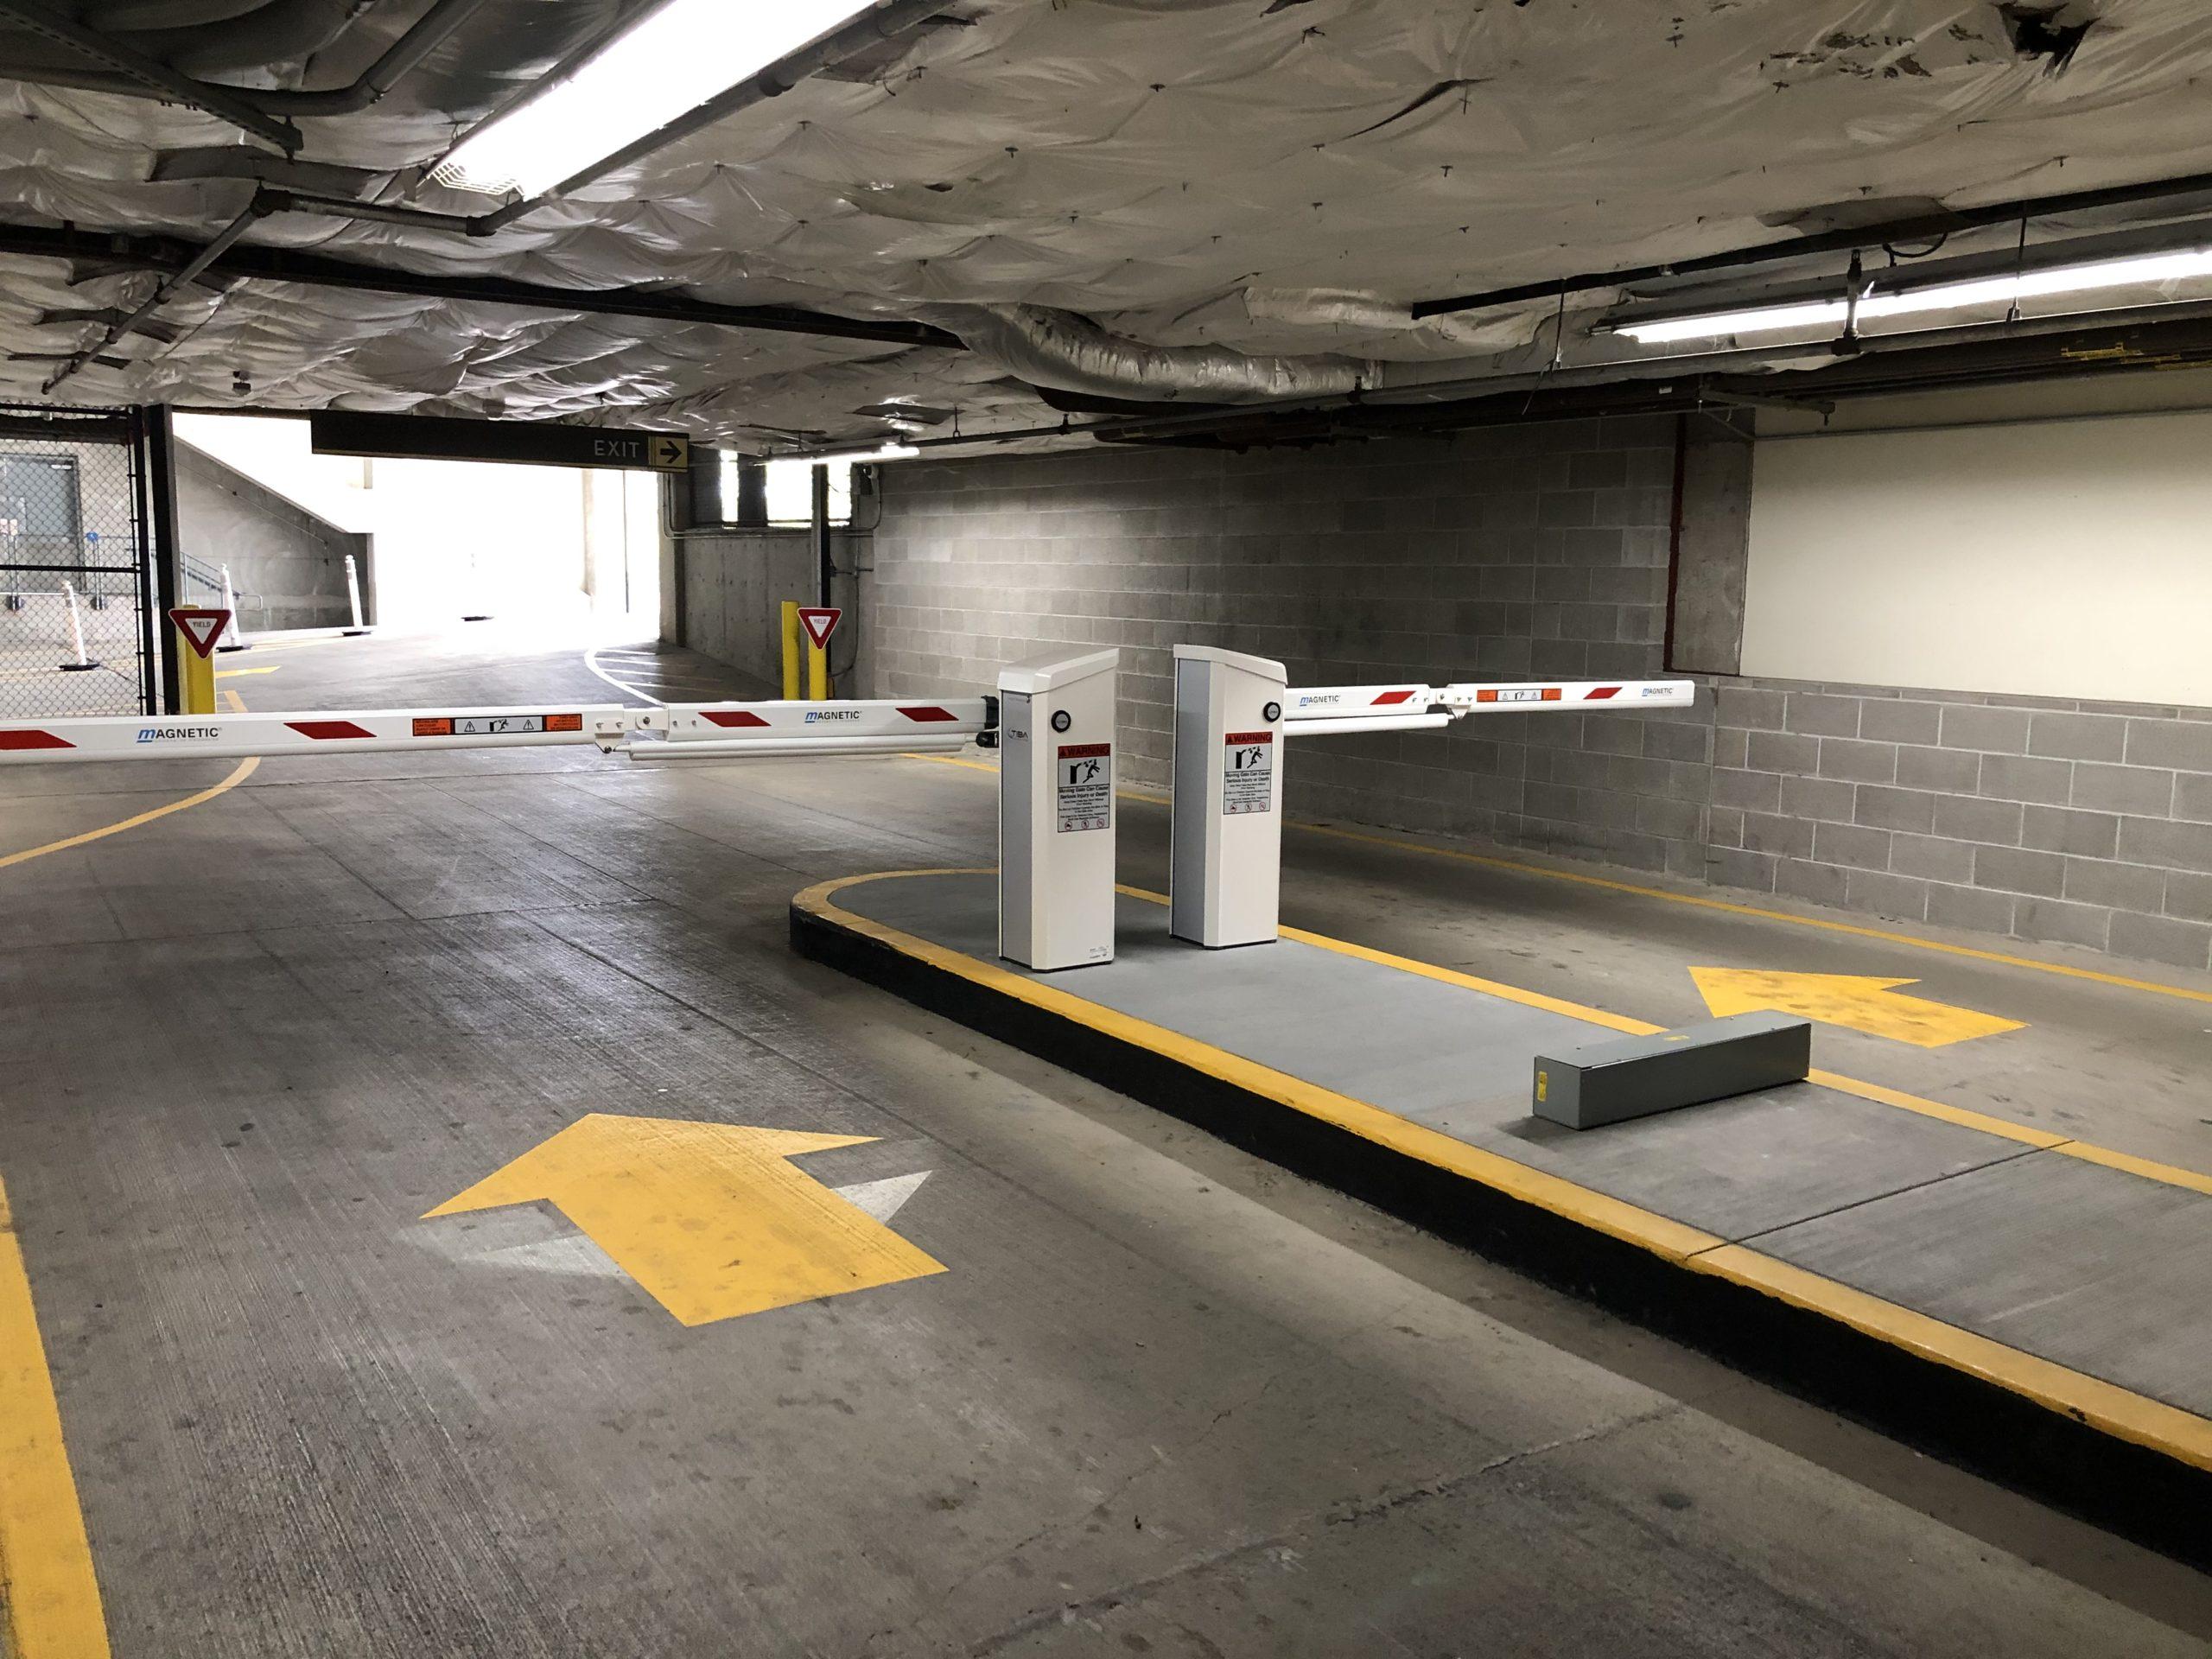 Parking Equipment exit gates